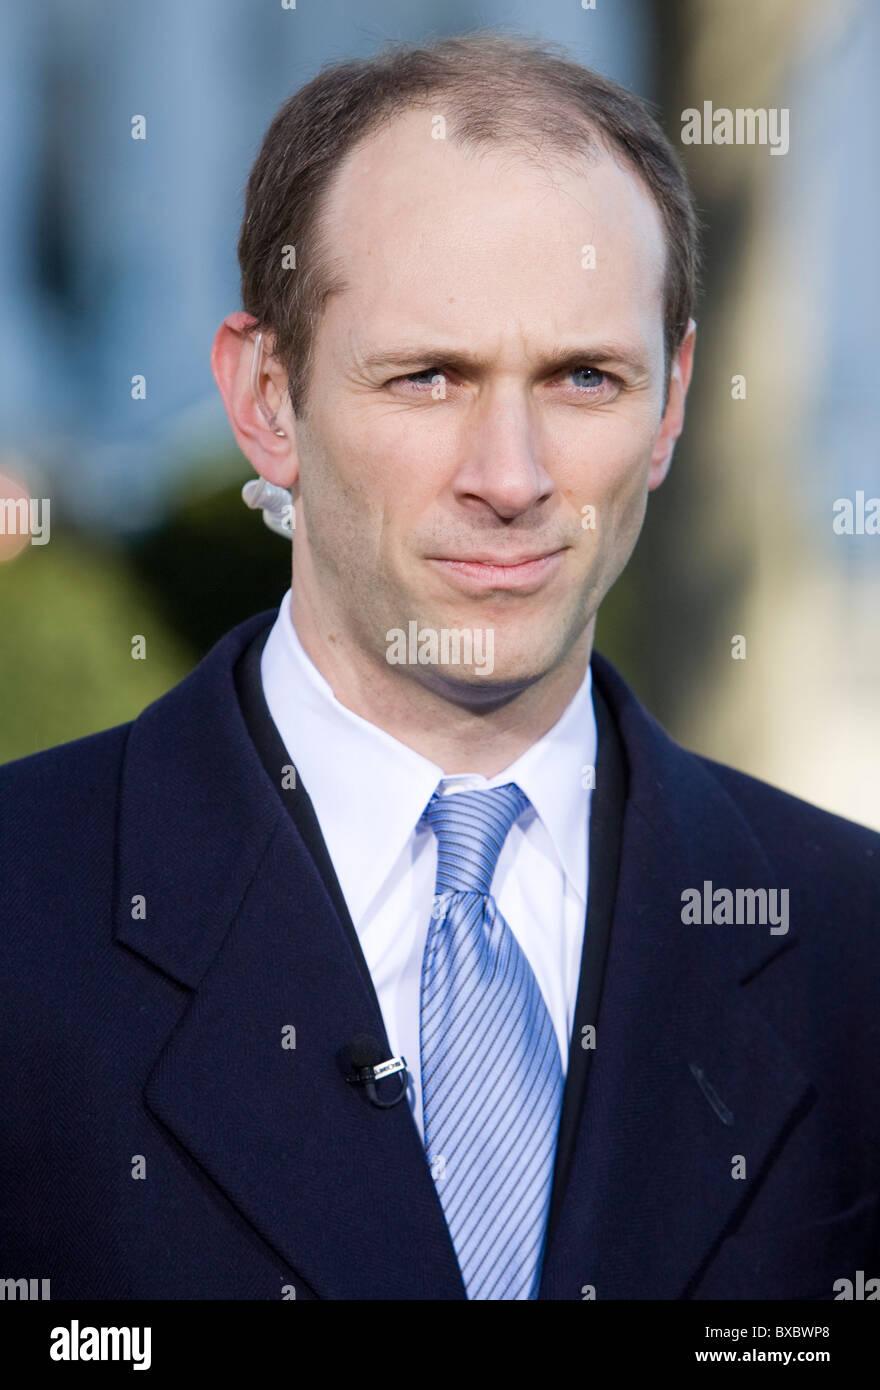 Austan Goolsbee, Chairman of the Council of Economic Advisers. - Stock Image